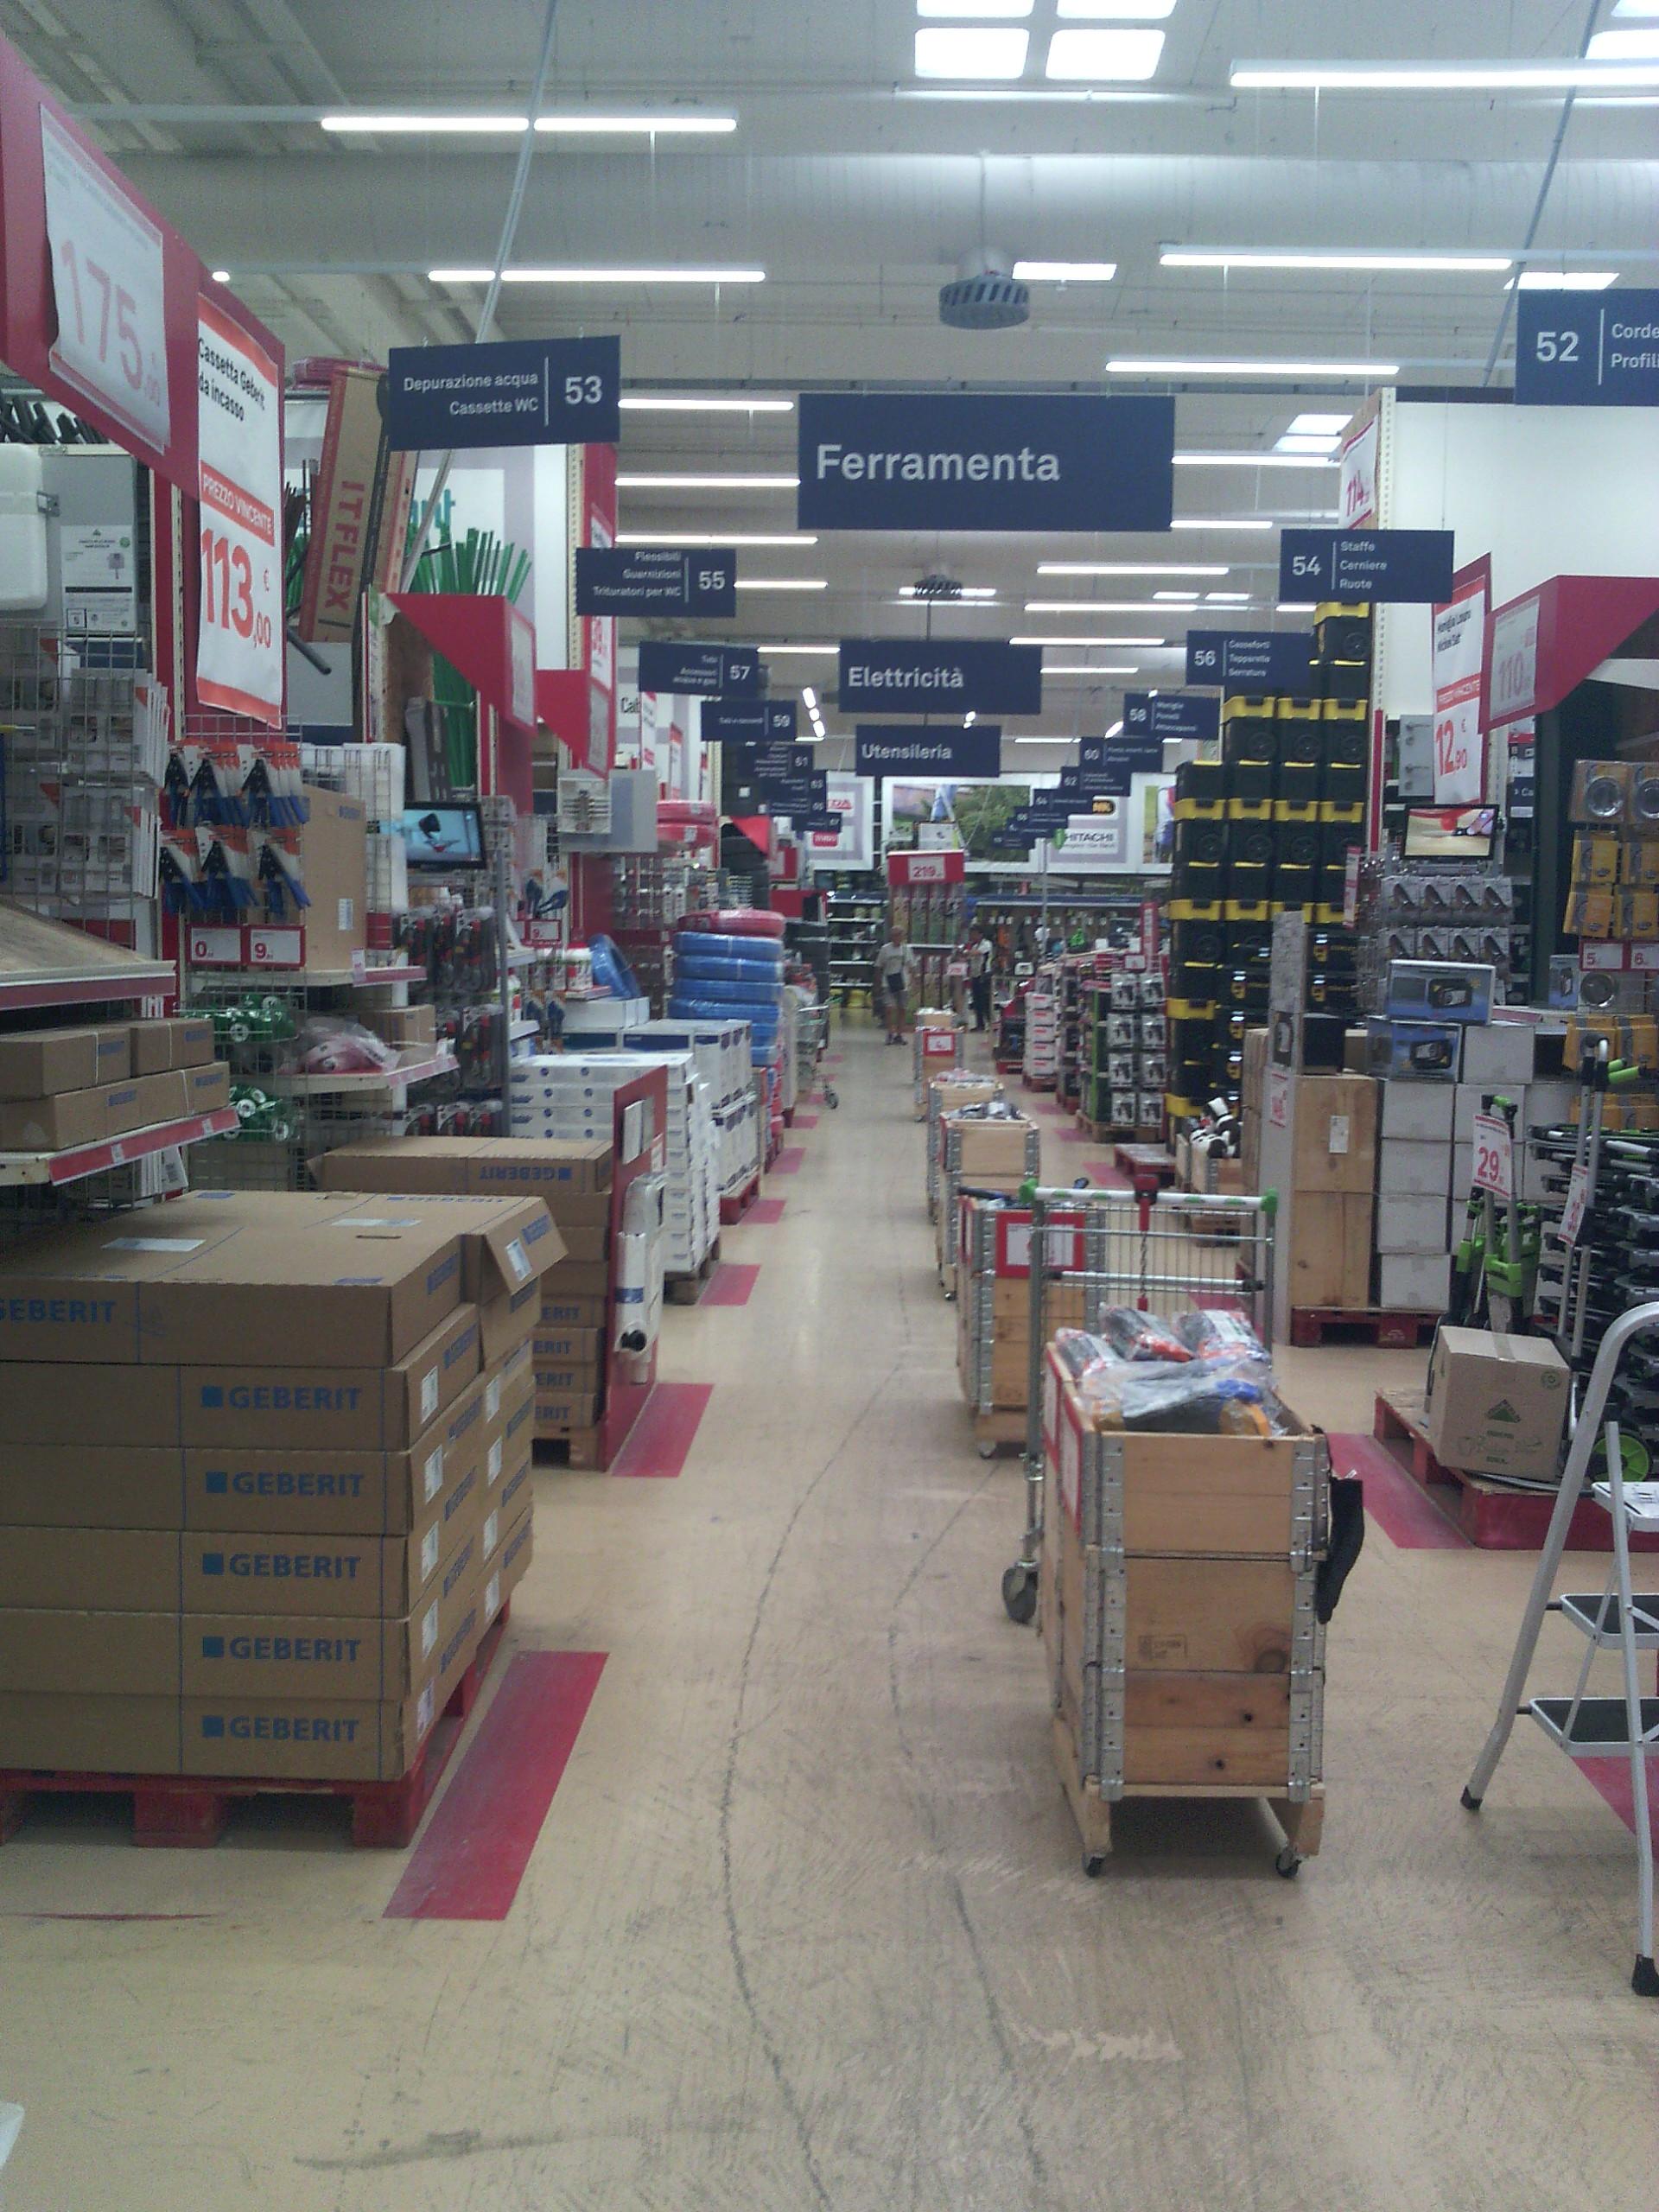 File Leroy Merlin Store In Bastia Umbra Interiors August 2019 11 Jpg Wikimedia Commons